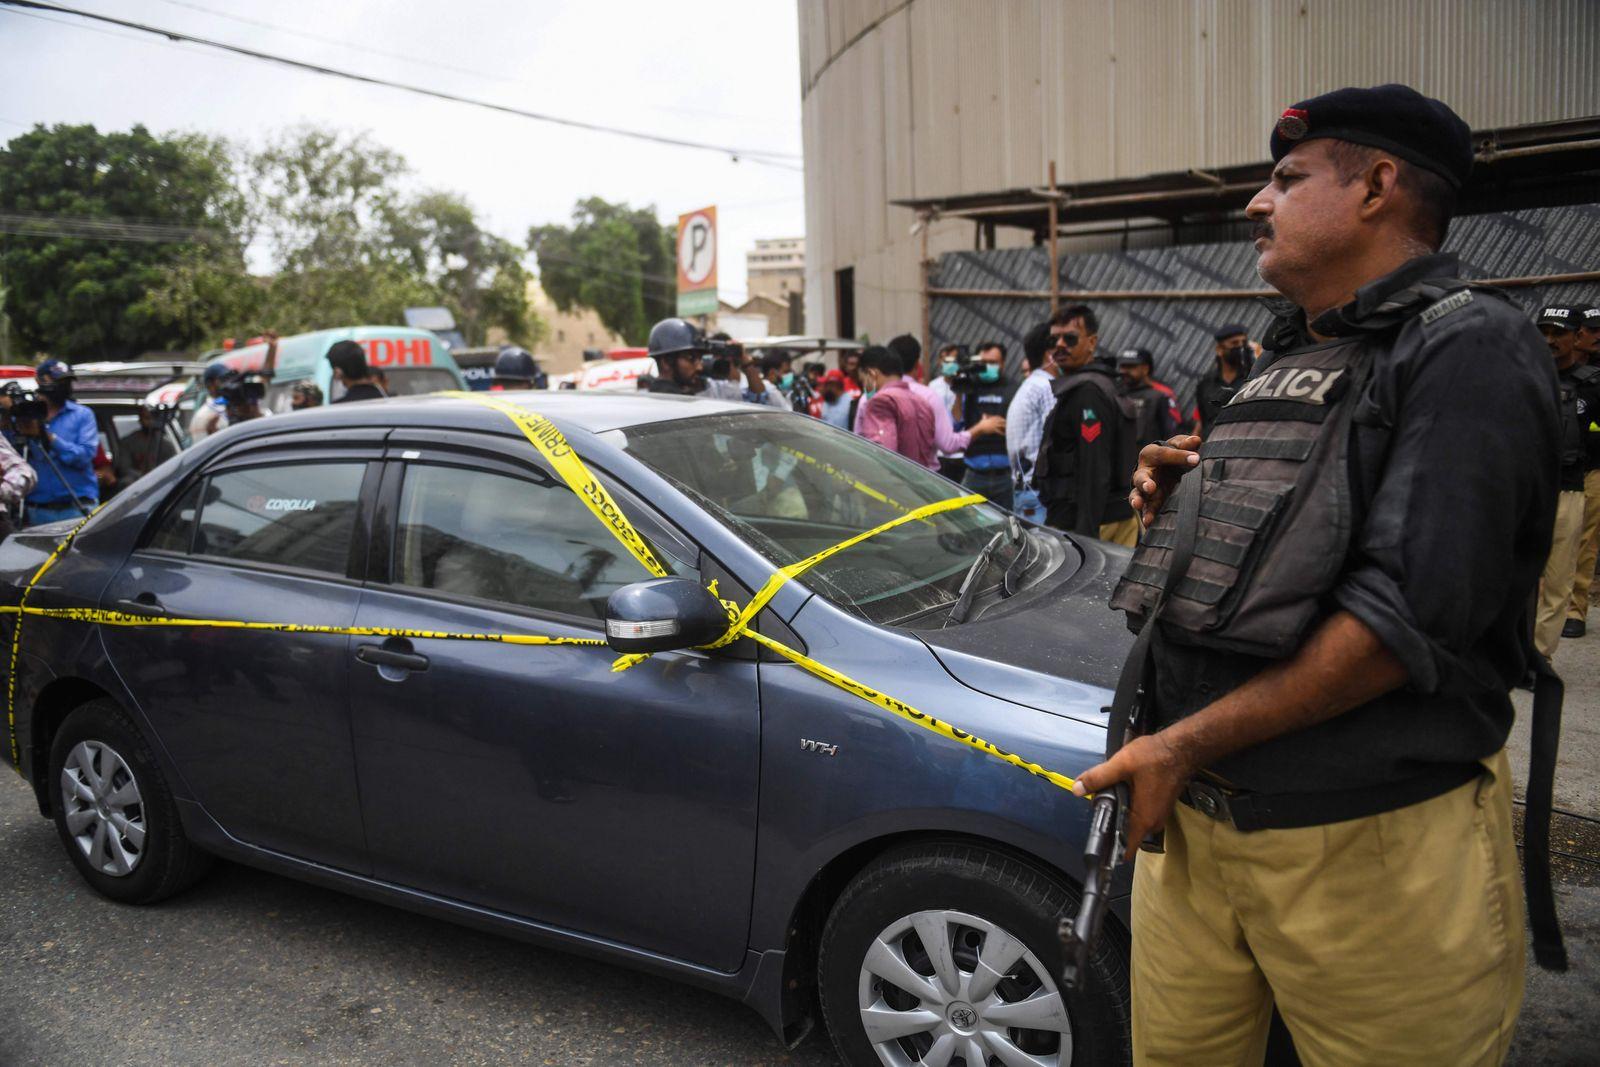 PAKISTAN-EXCHANGE-ATTACKS